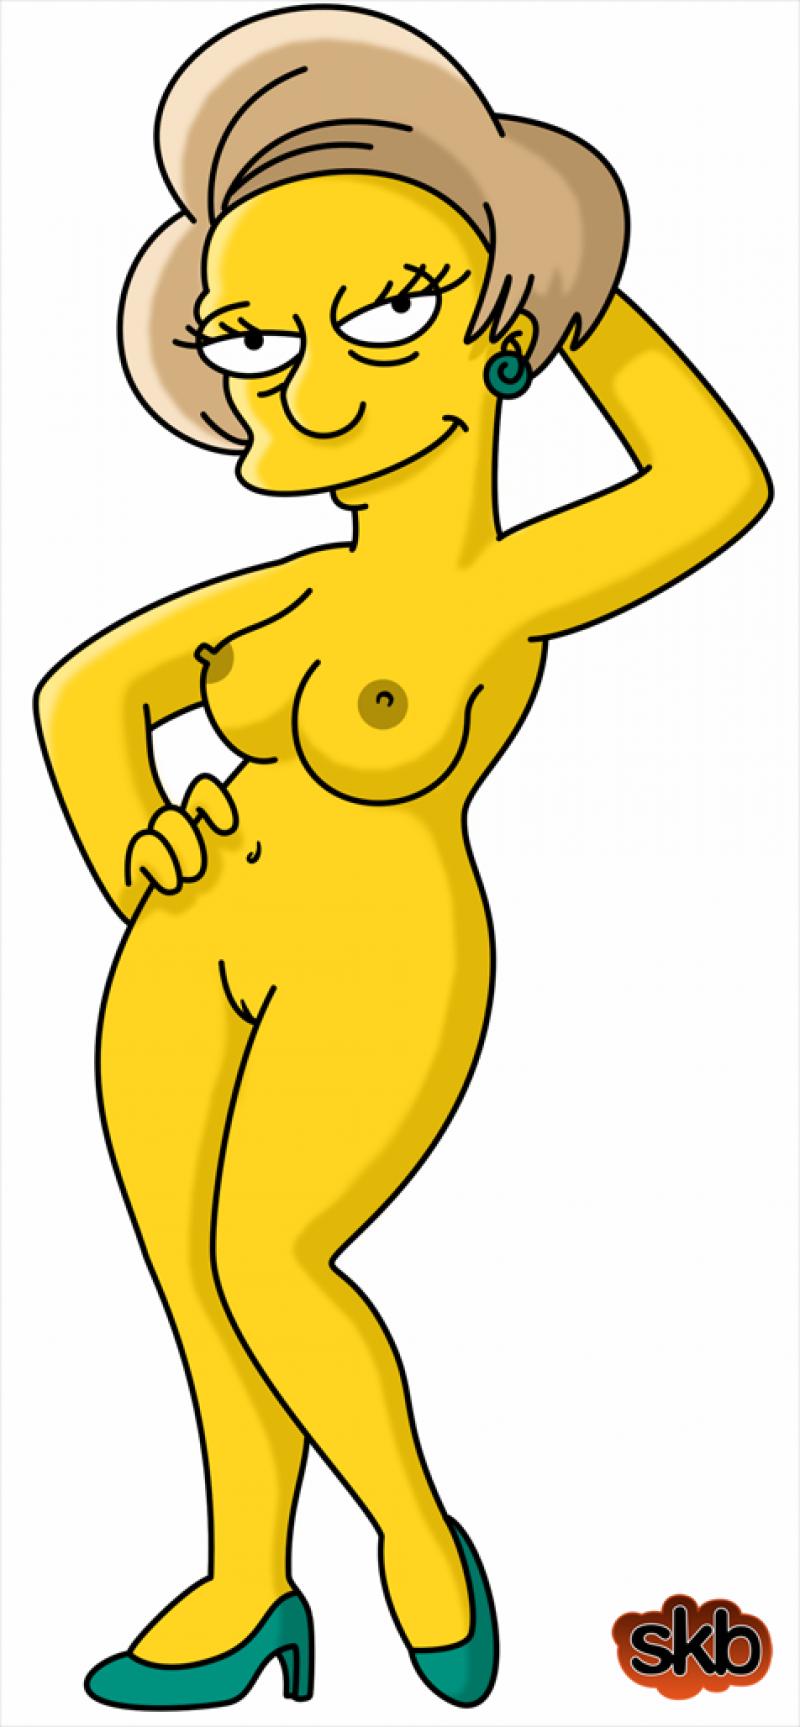 Ms. Krabappel  Marge Simpson Maude Flanders Bart Simpson MilHouse